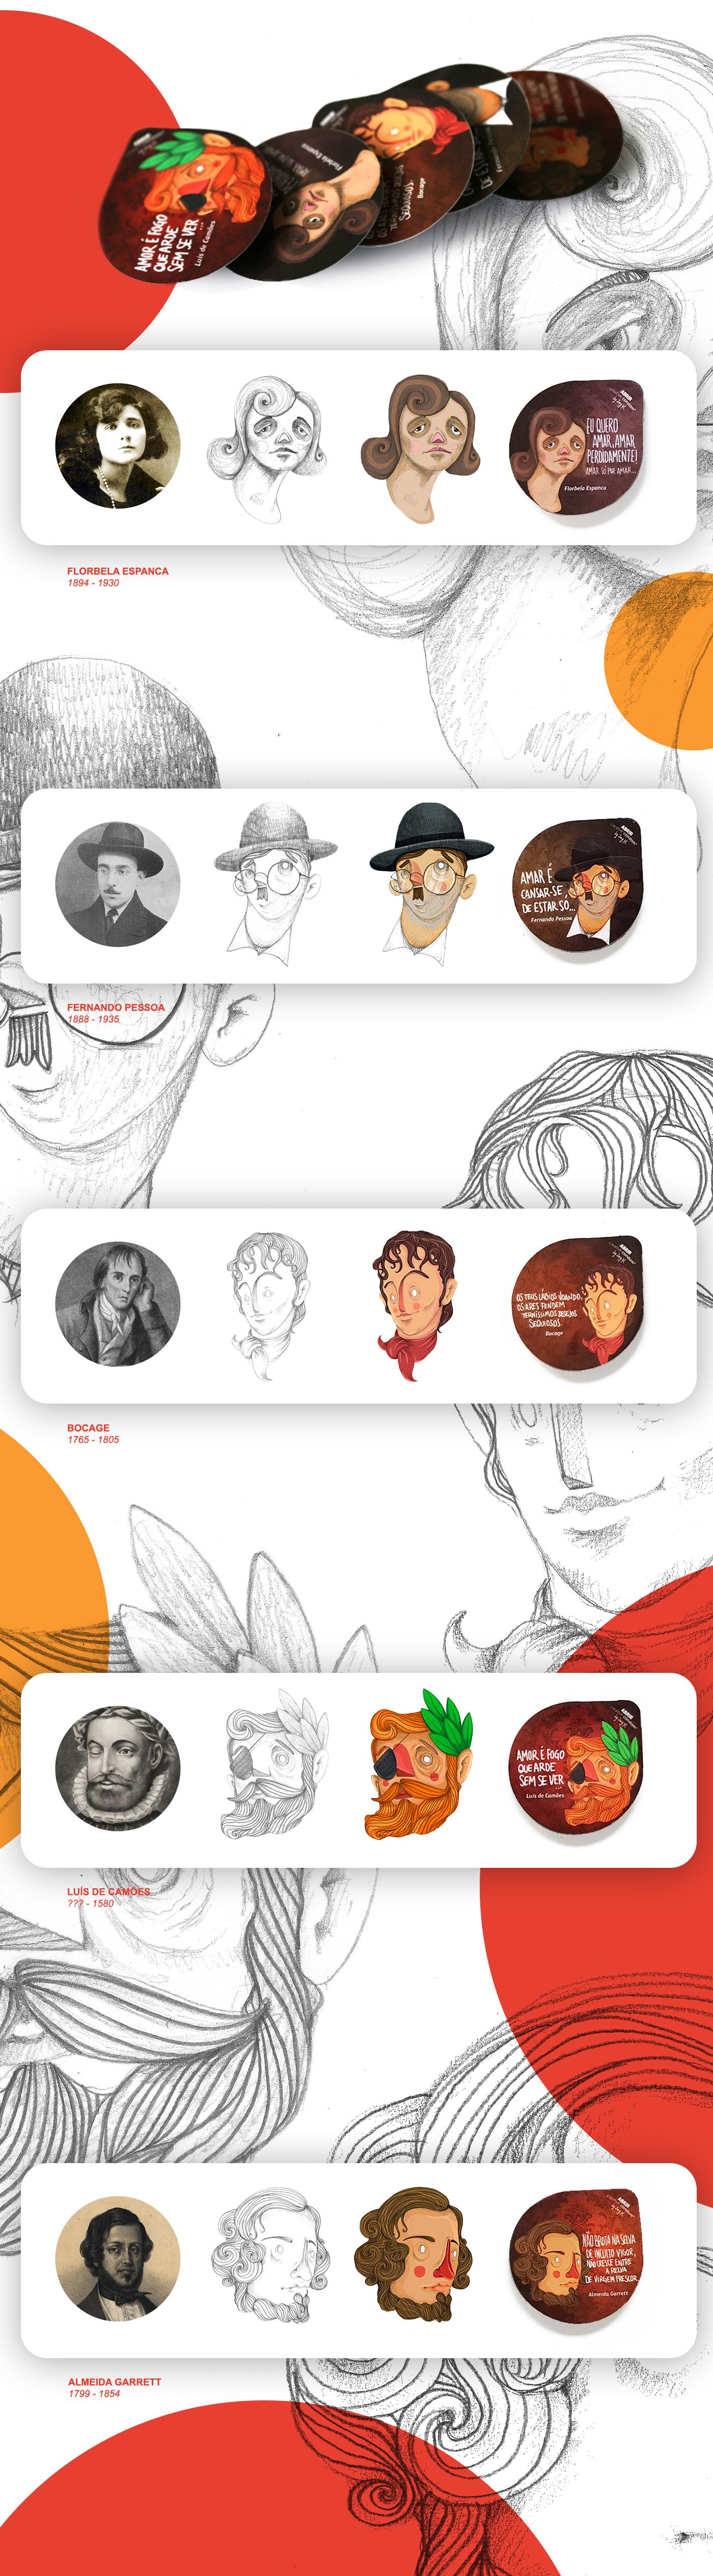 TiagoVaz_Creative_Condoms_03.2.jpg